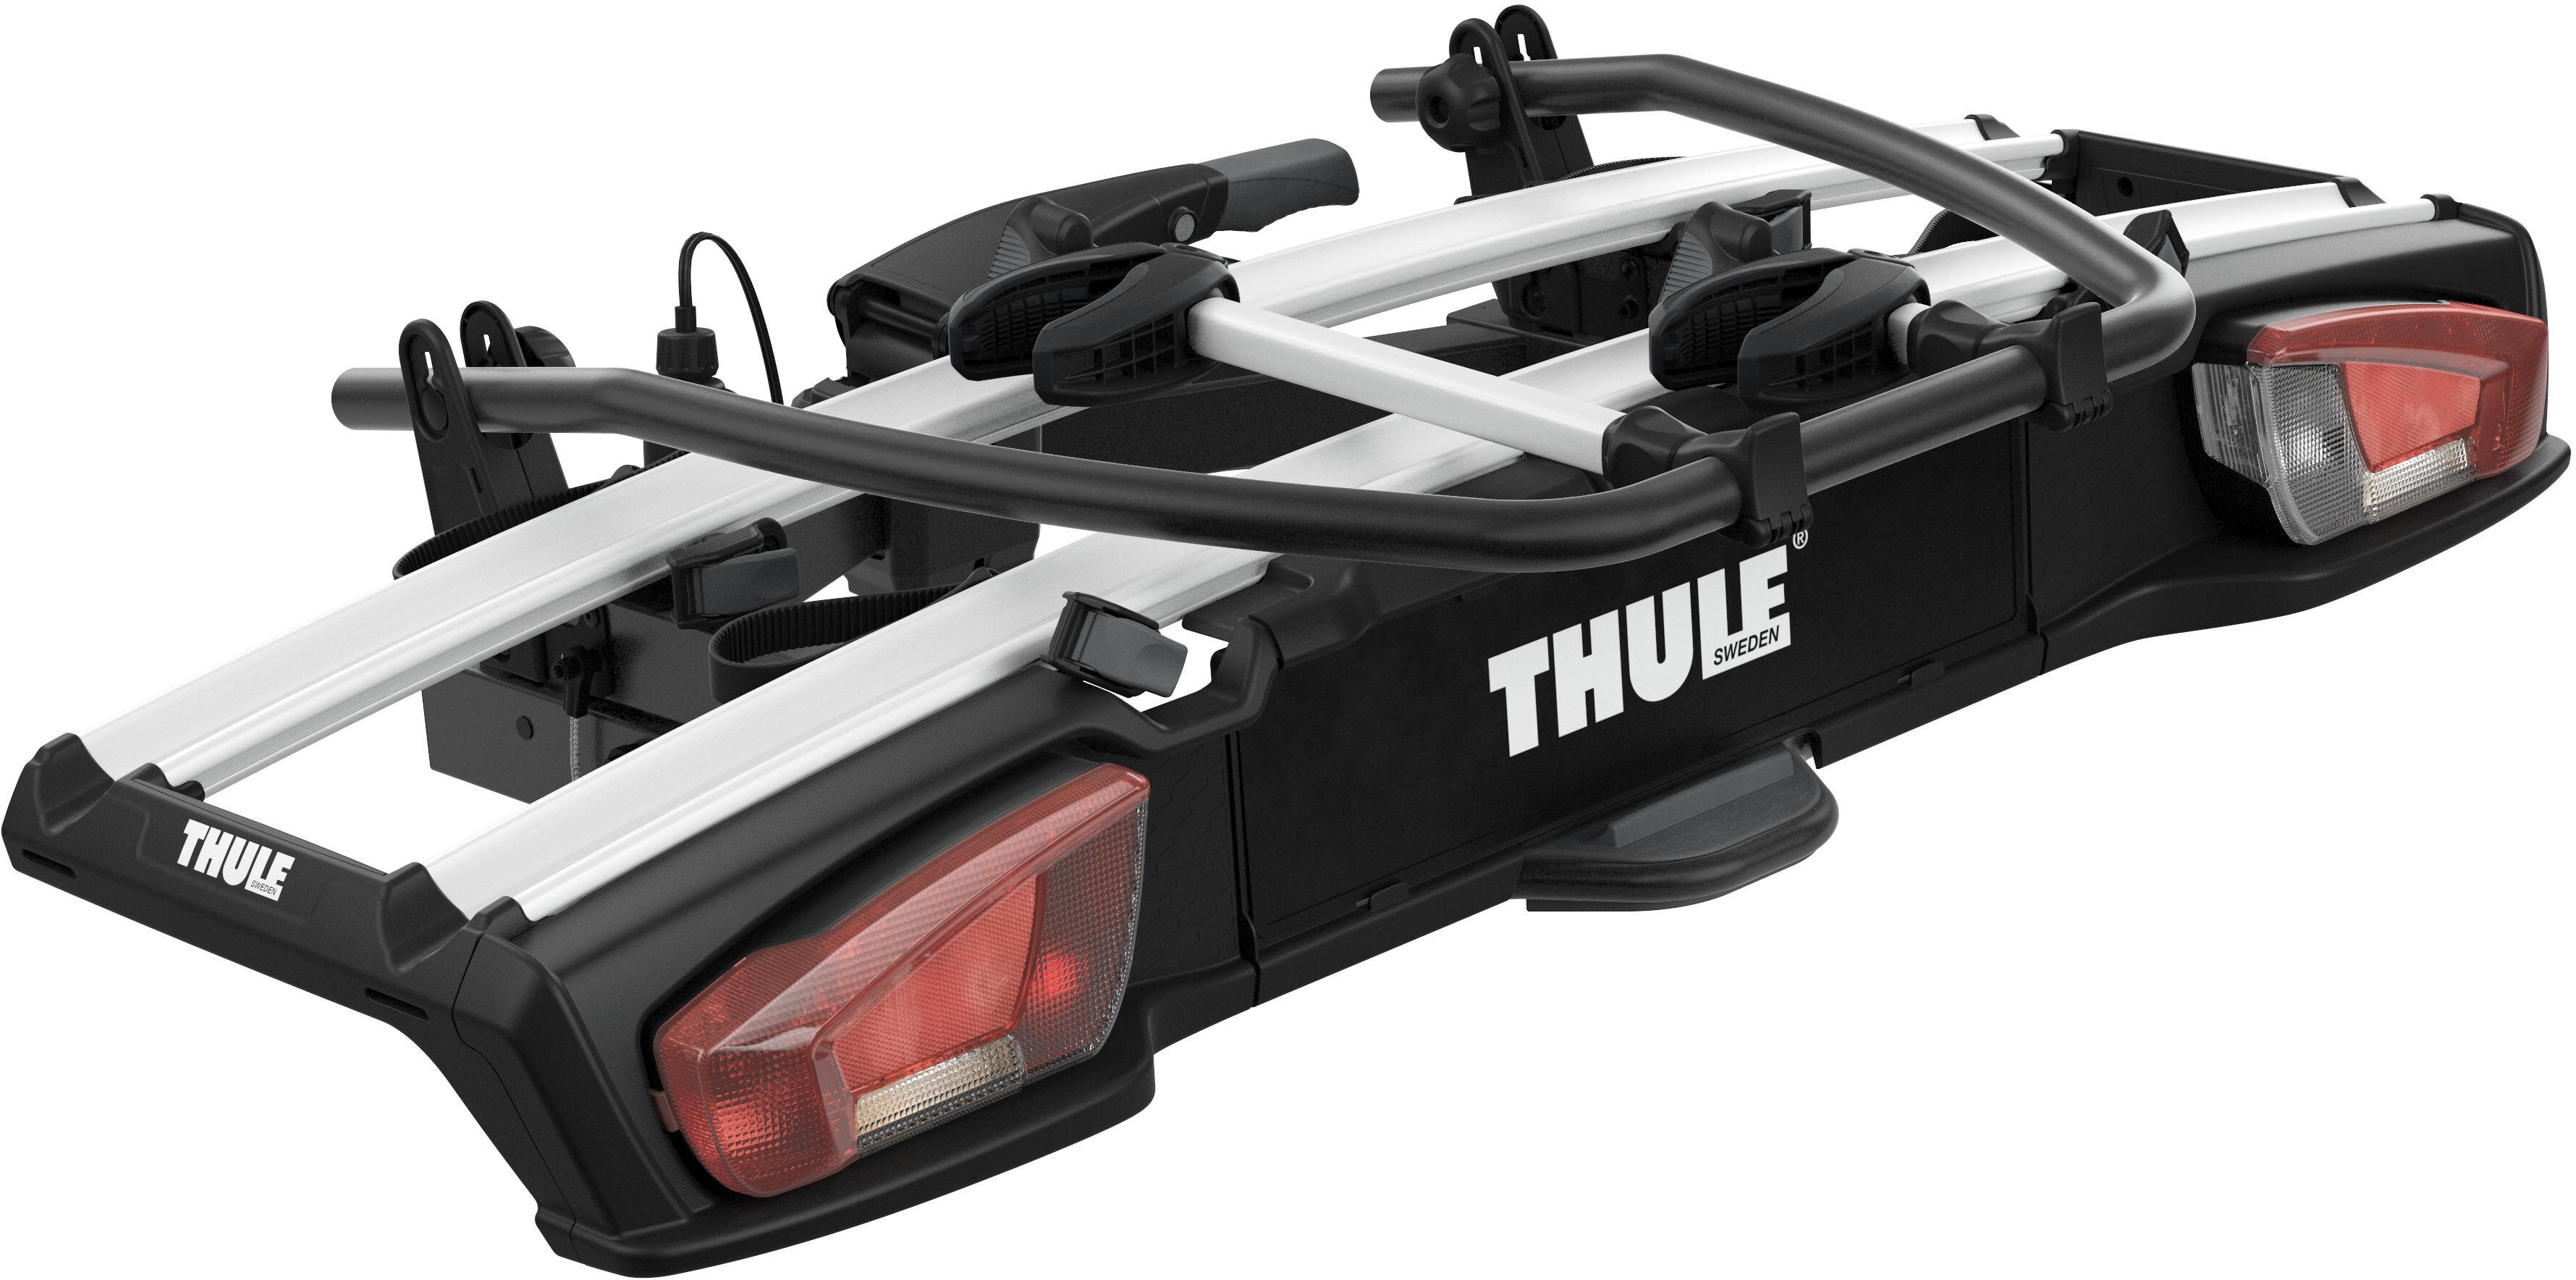 Højmoderne Thule VeloSpace XT Cykelholder til 2 cykler | Find cykeltilbehør VQ-97